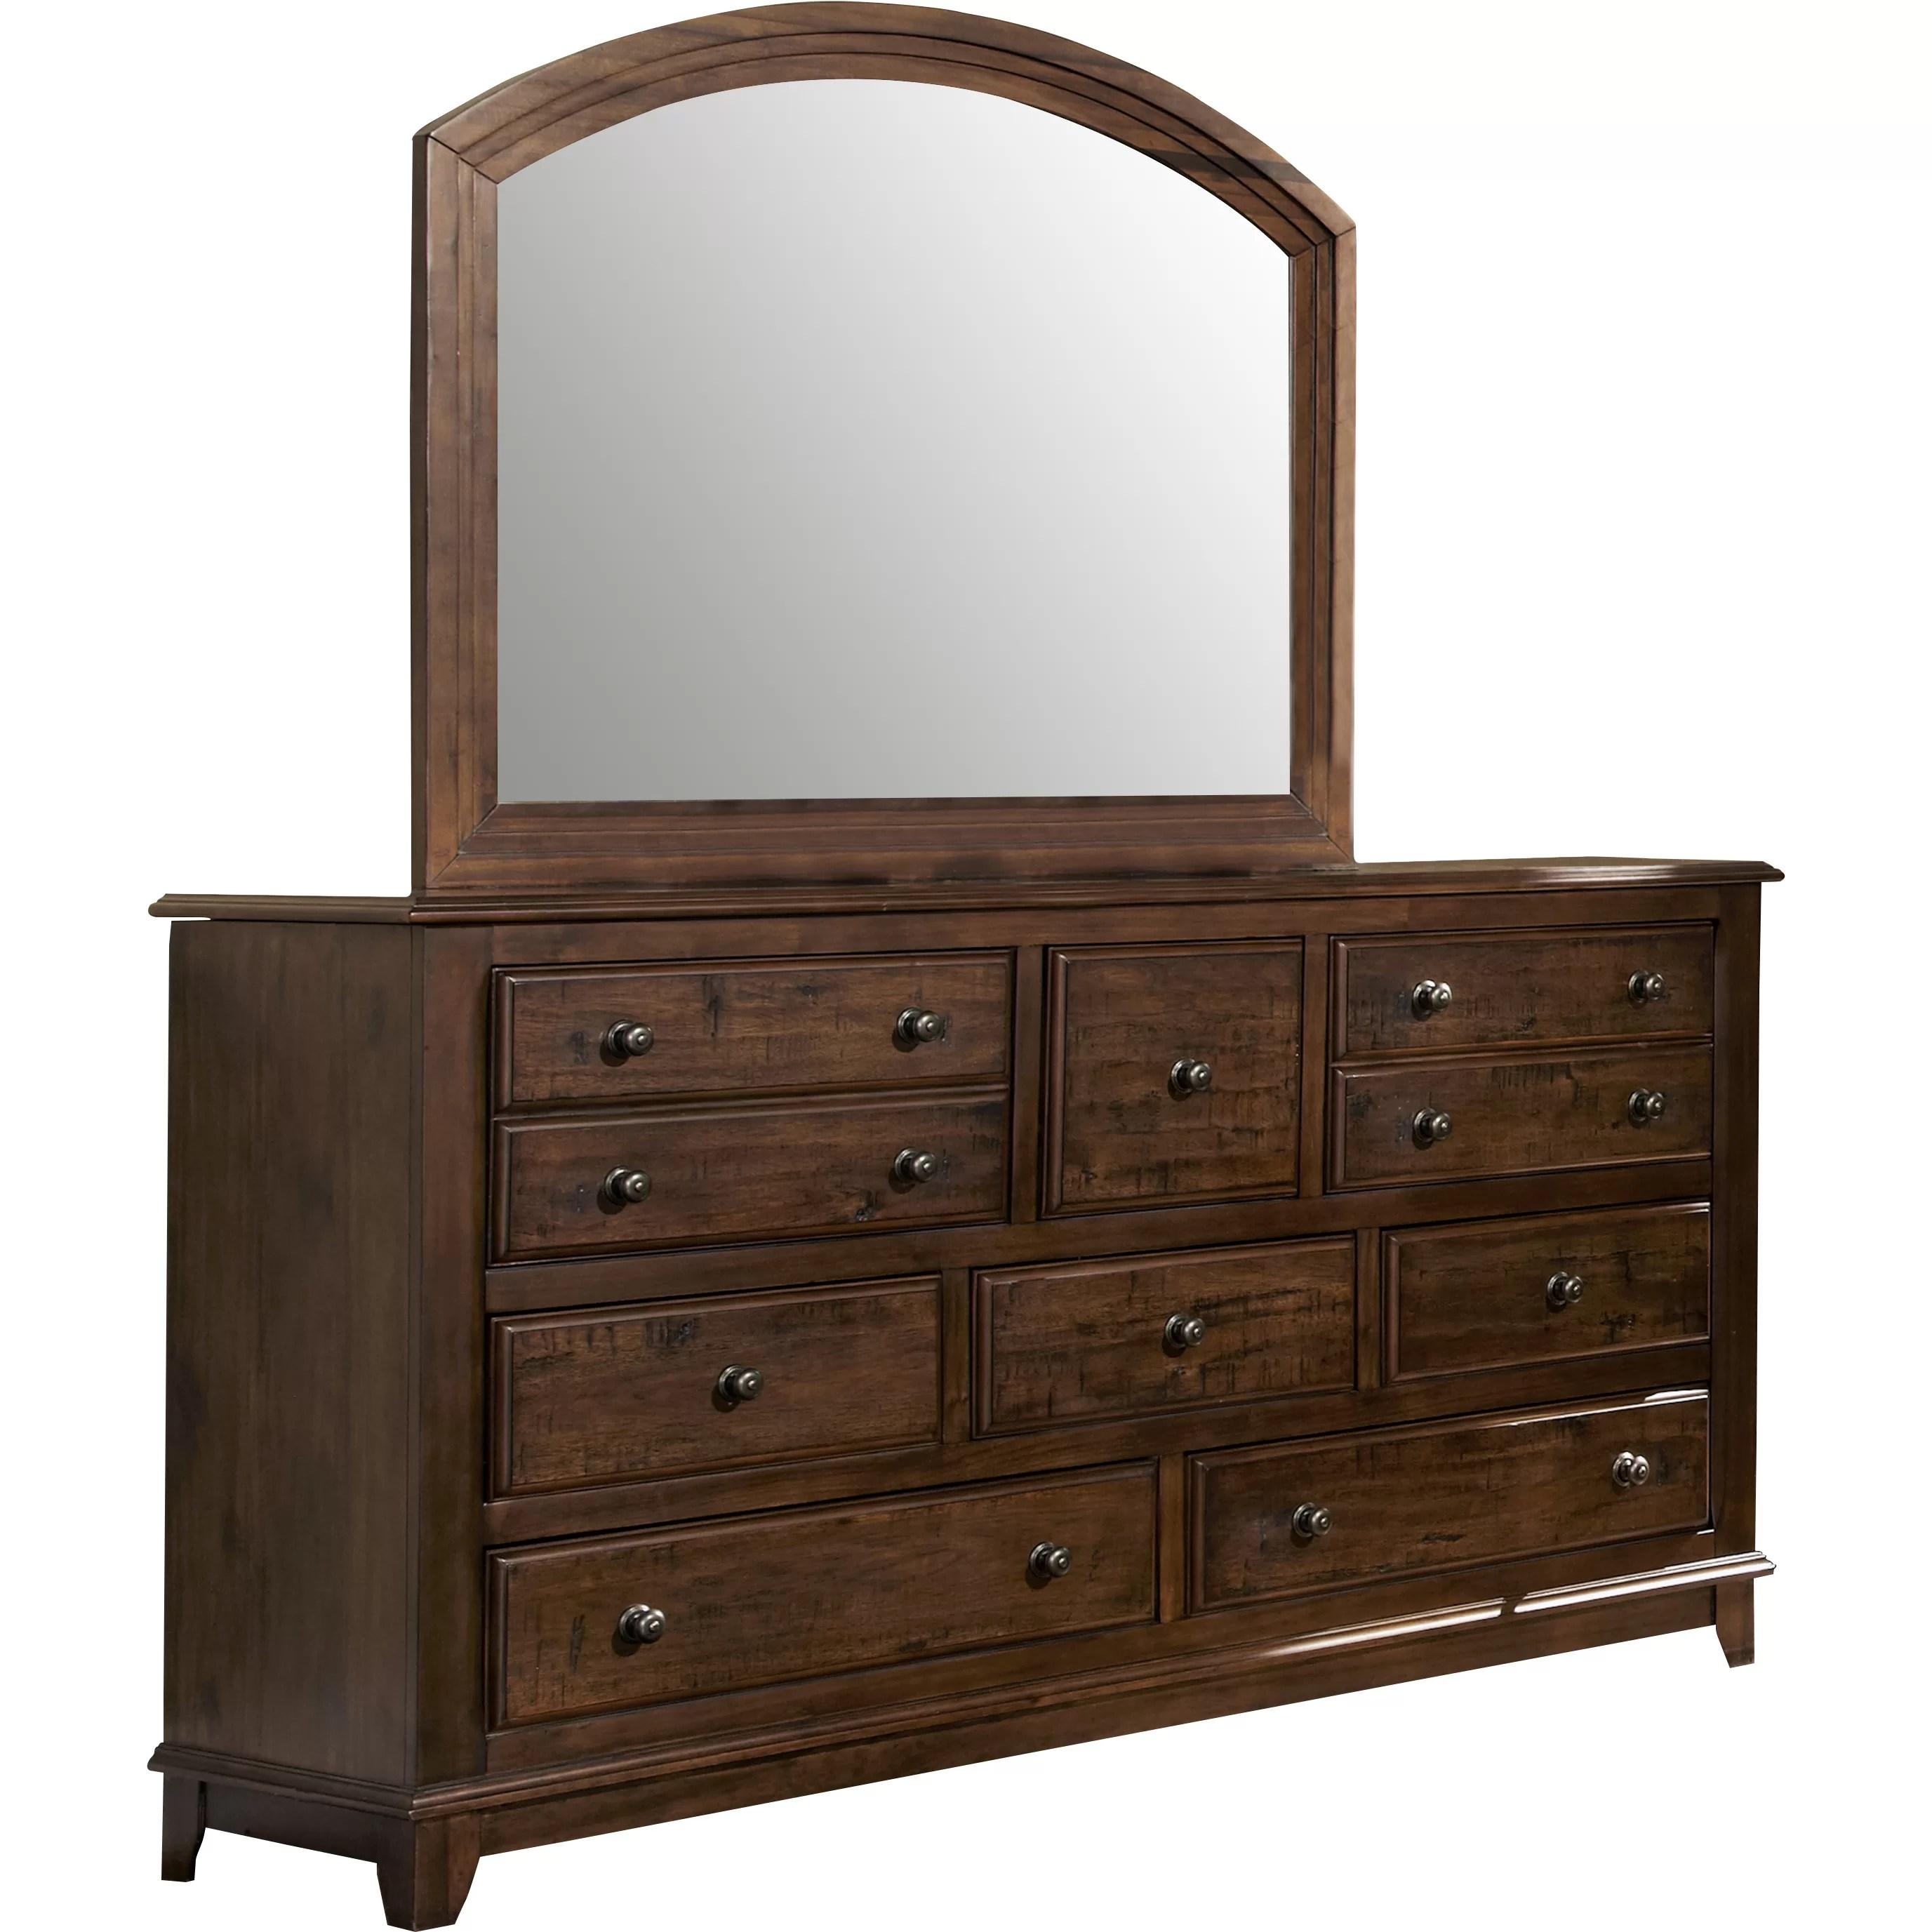 Darby Home Co Newbury 8 Drawer Dresser with Mirror  Reviews  Wayfair